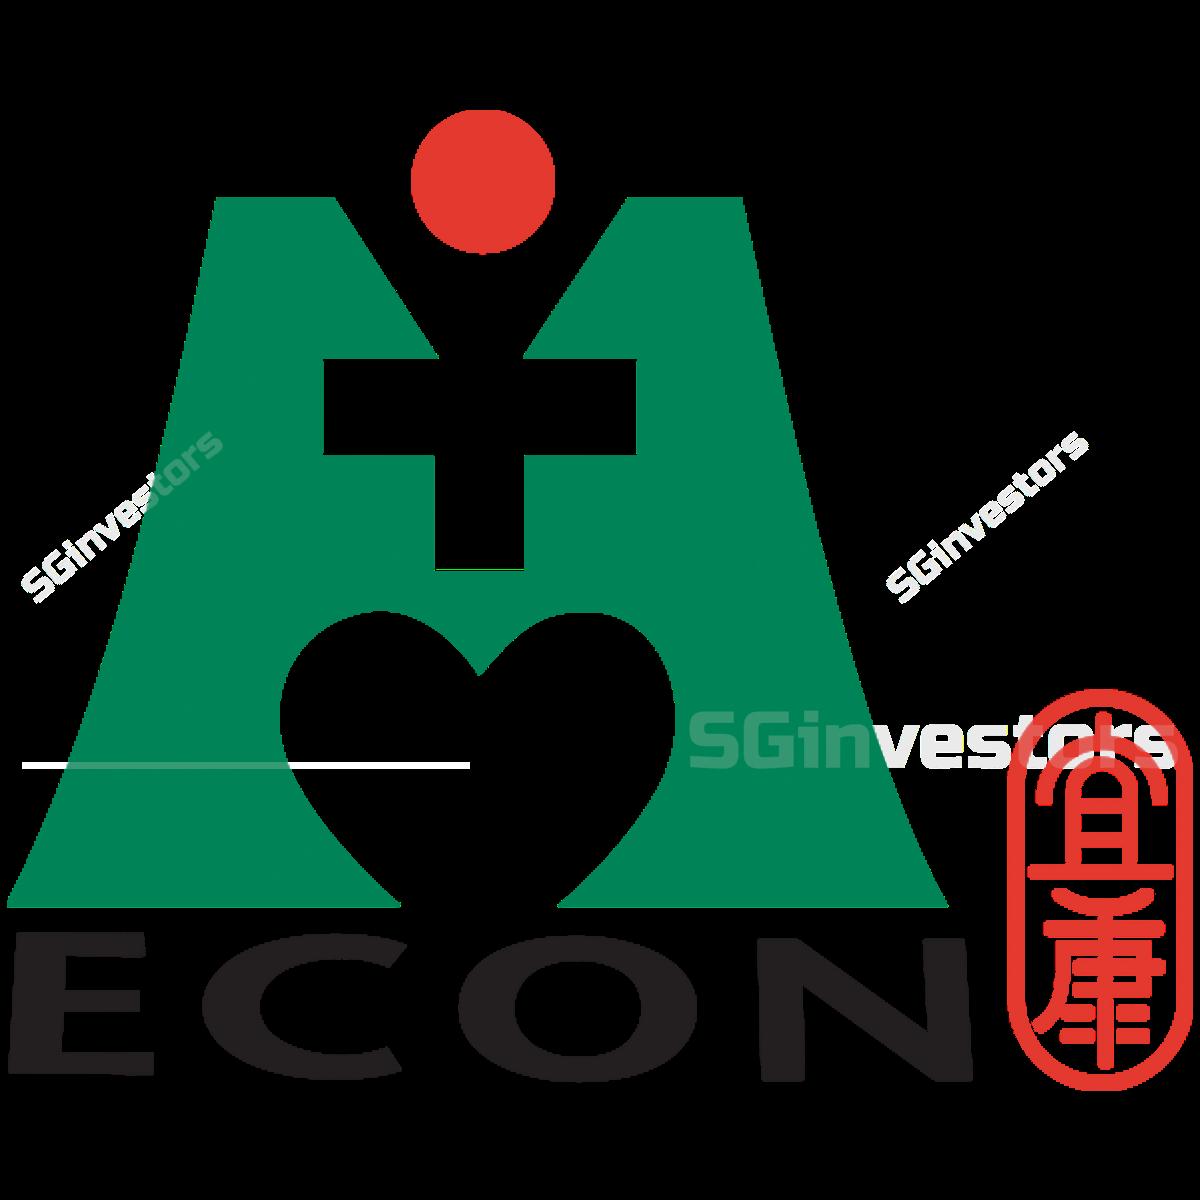 ECON HEALTHCARE (ASIA) LIMITED (SGX:EHG) @ SGinvestors.io